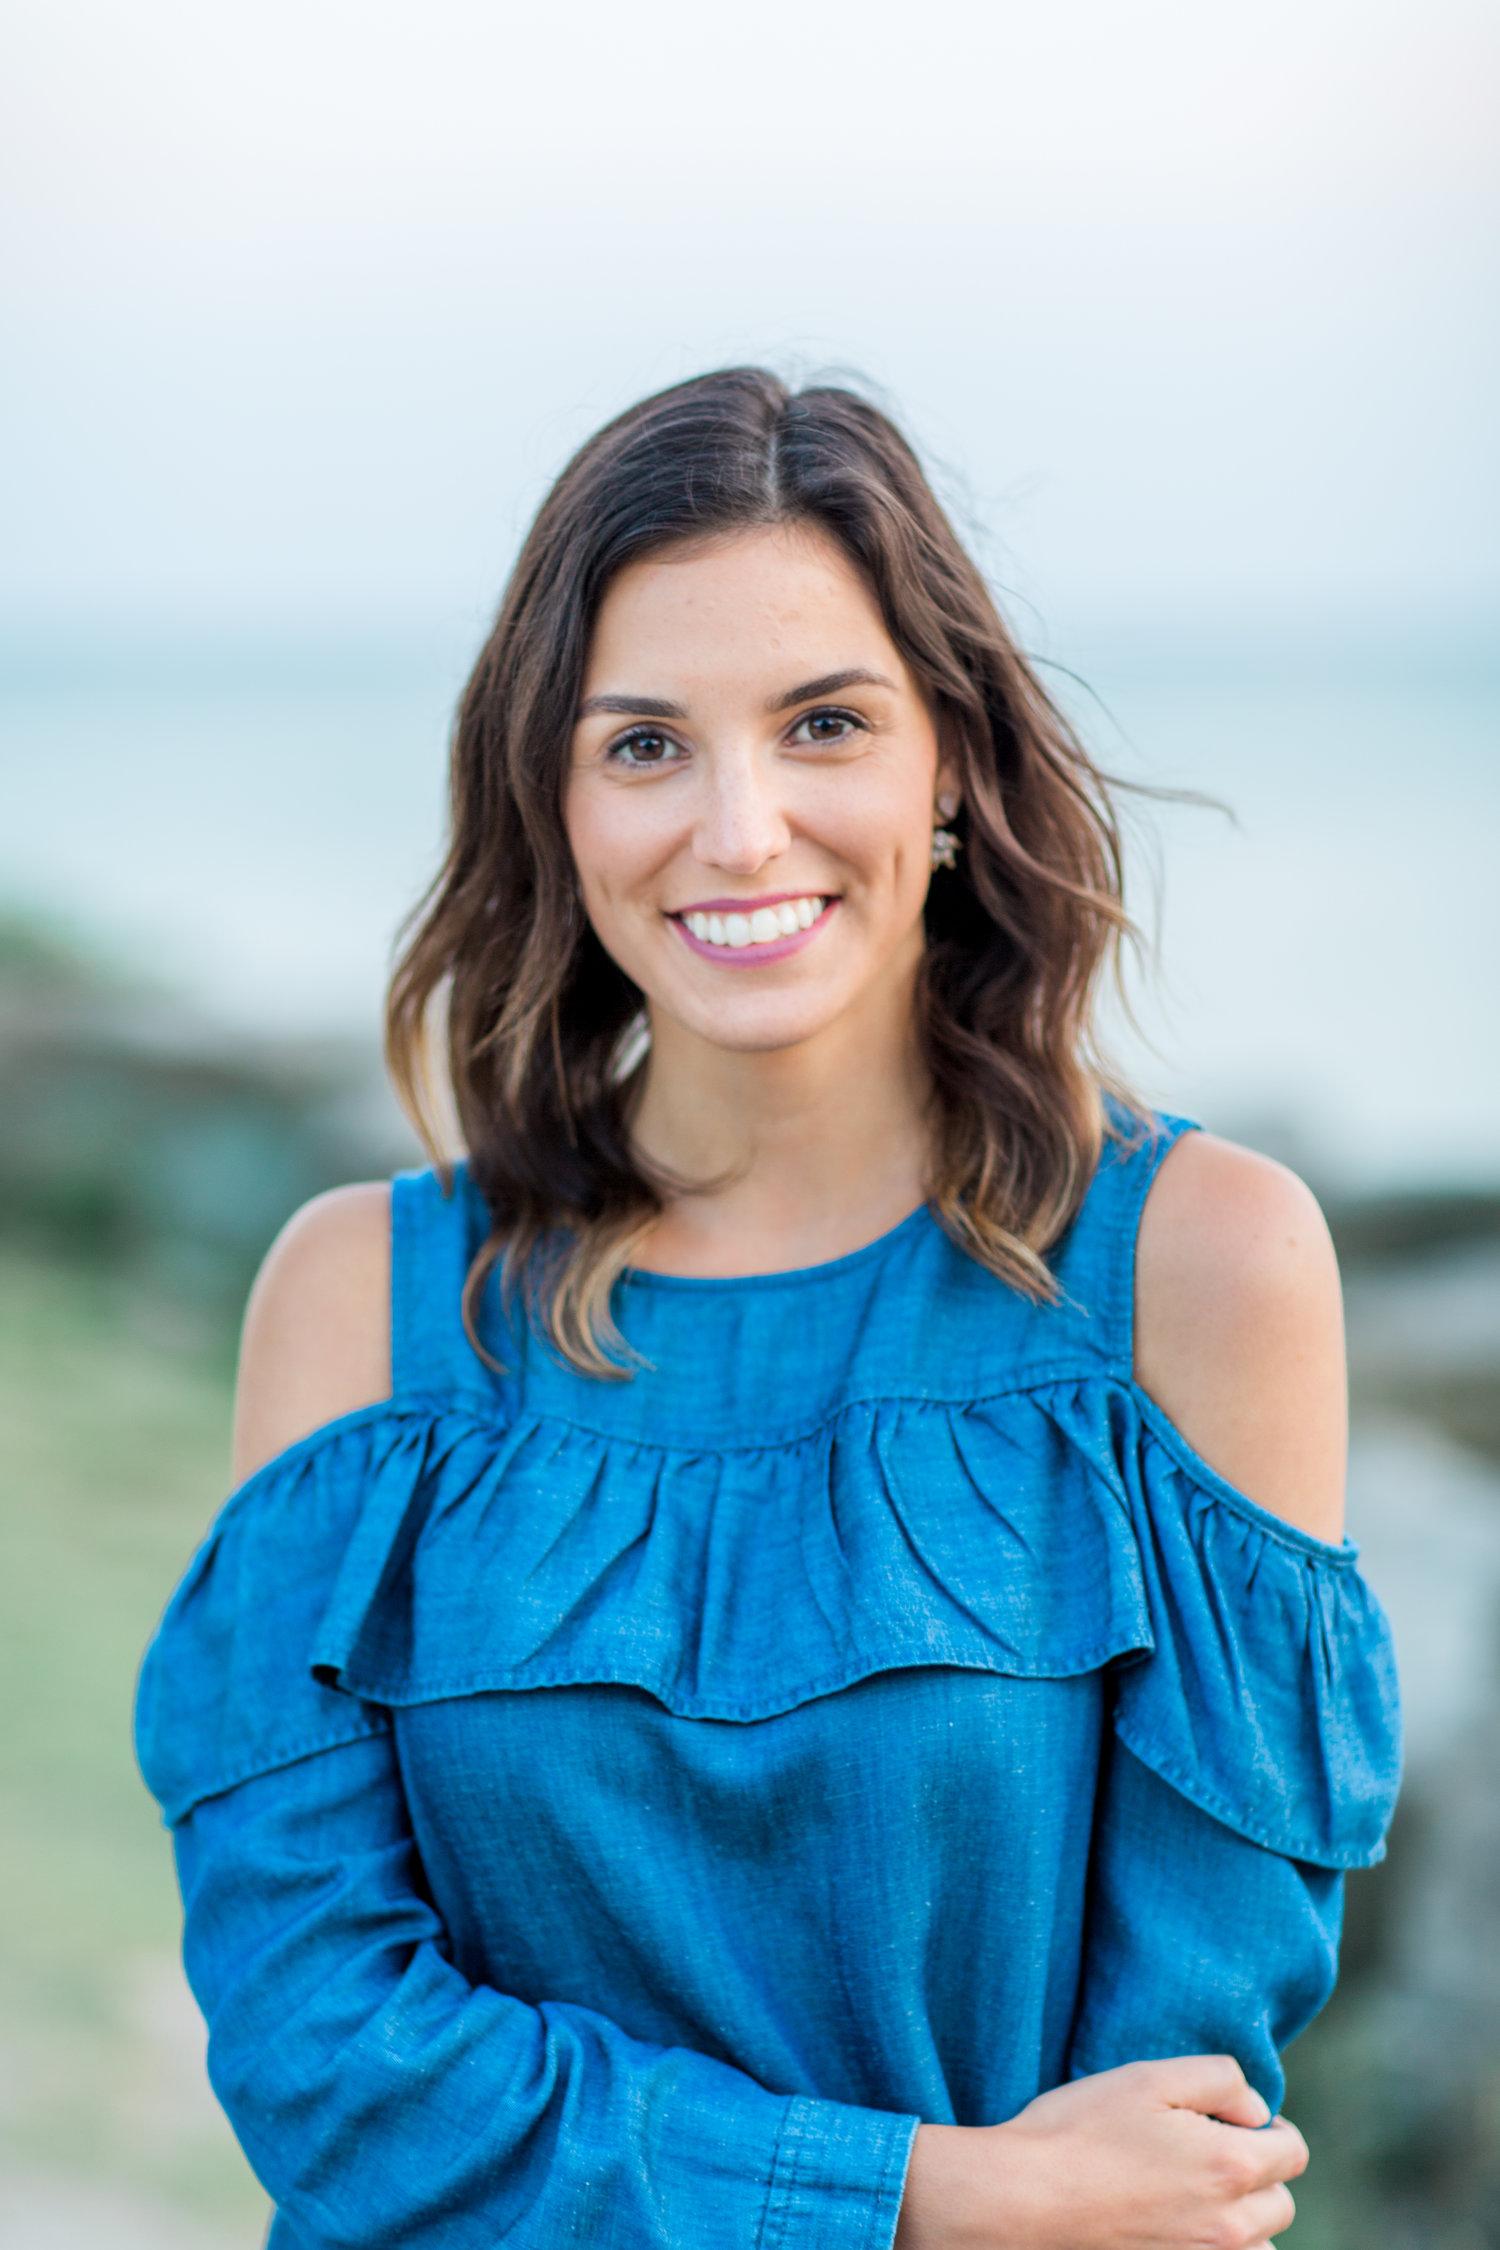 Danielle-Giroux-Amir-Golbazi-Genua-Family-Photography-Scarborough-Bluffs-0434.jpg